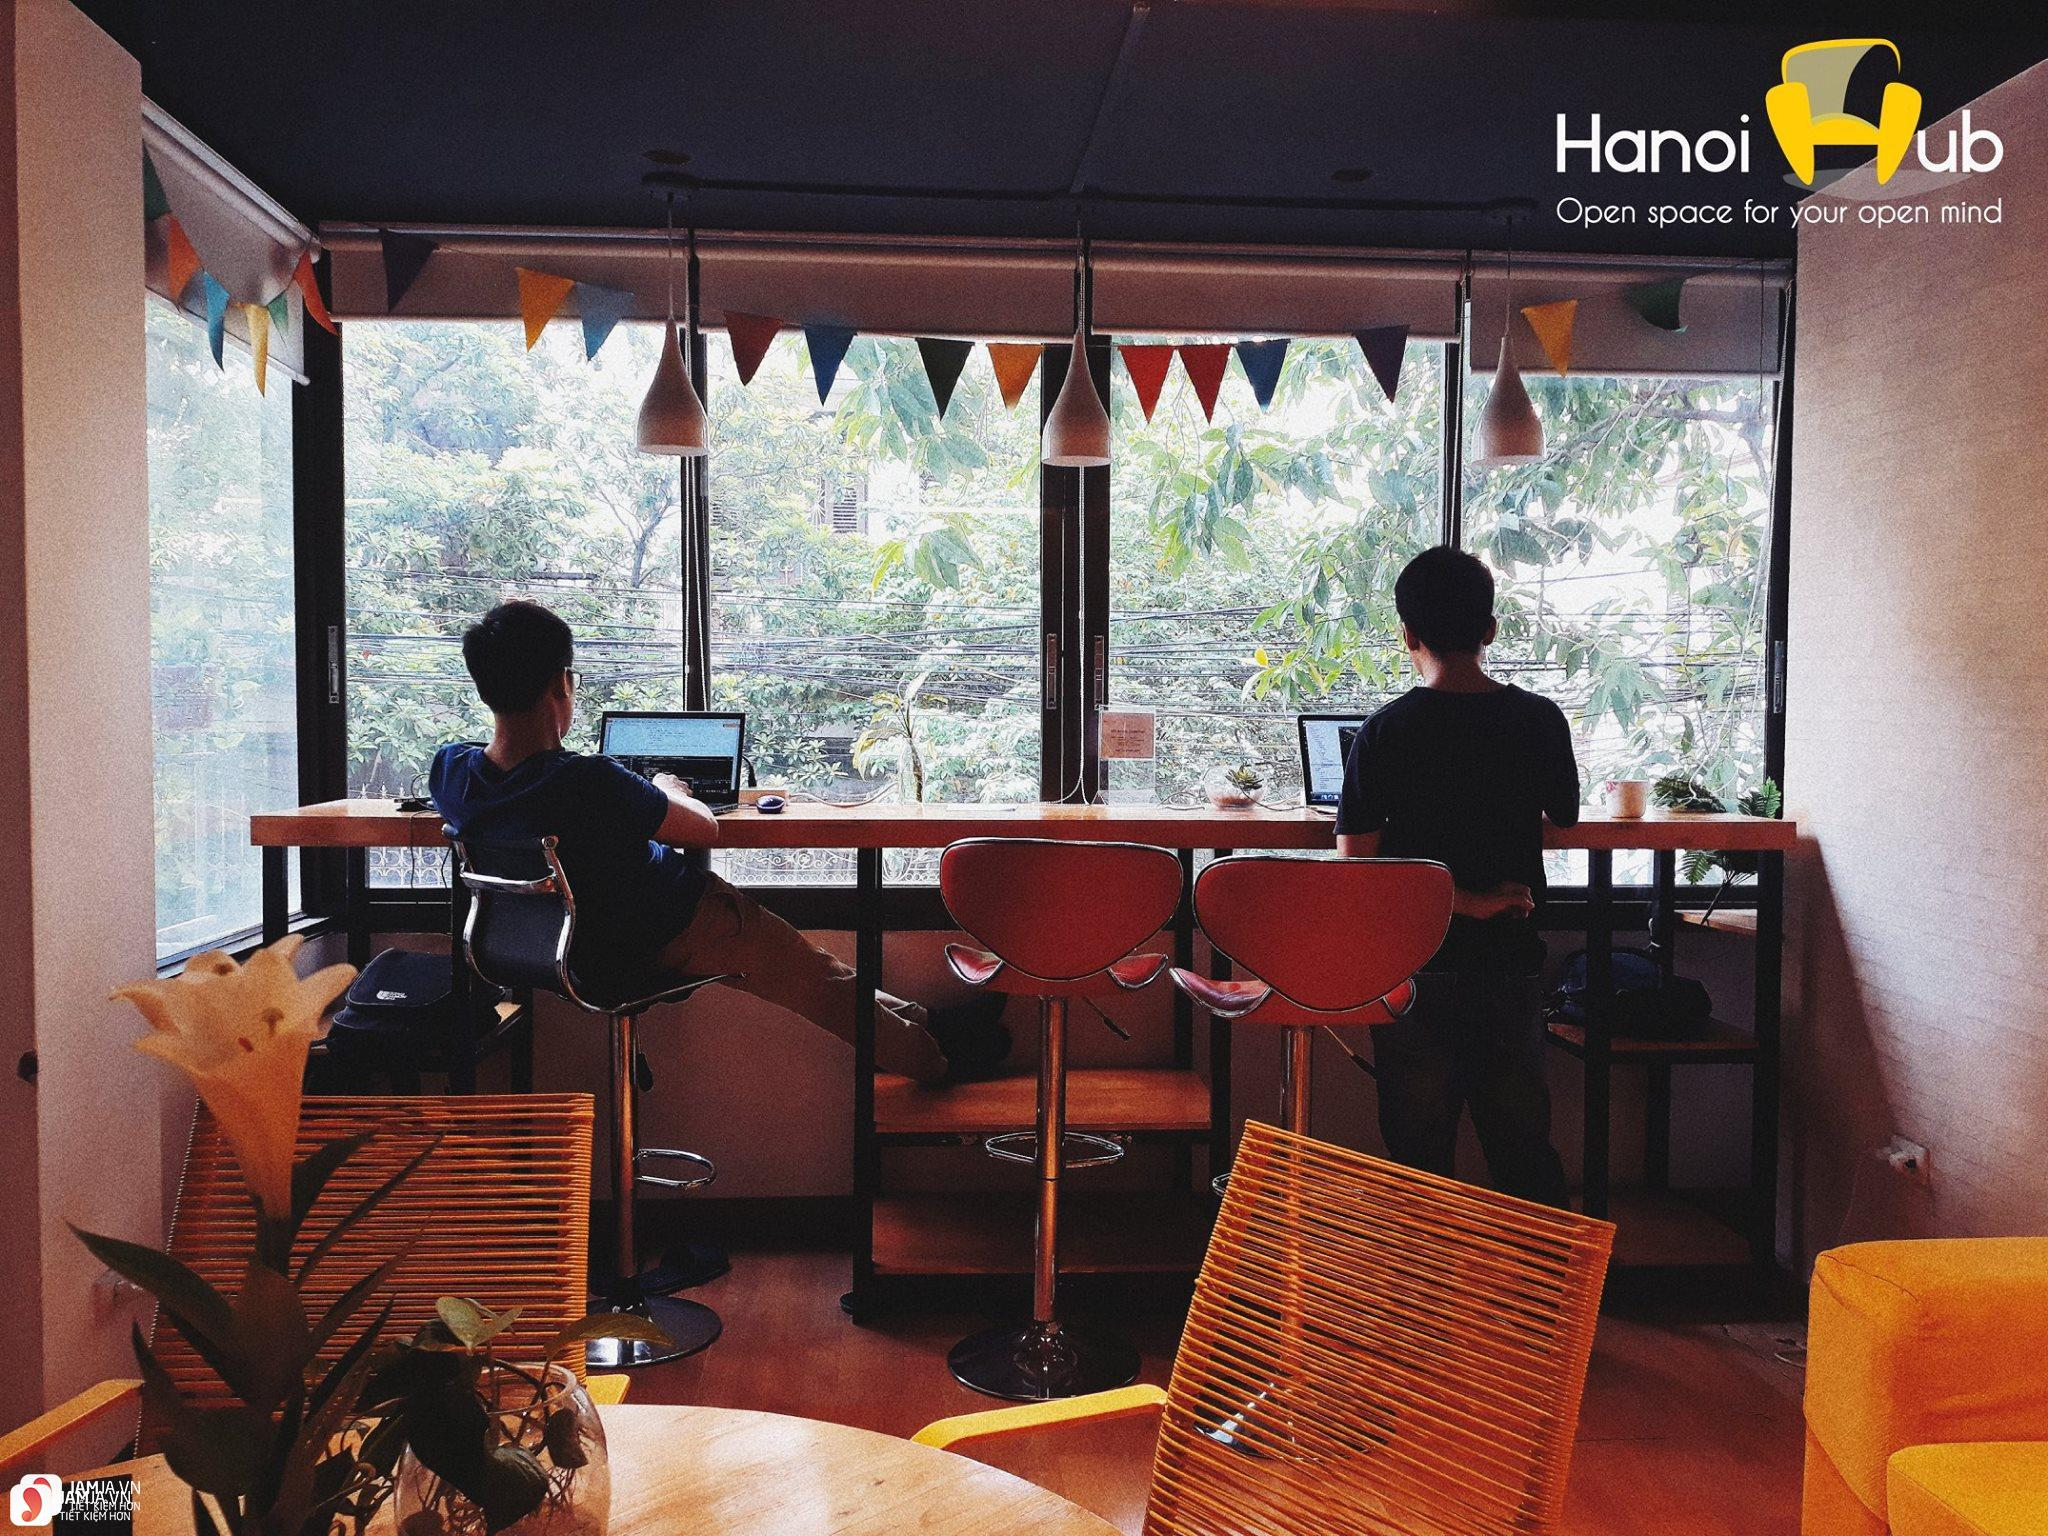 HanoiHub Coworking Space